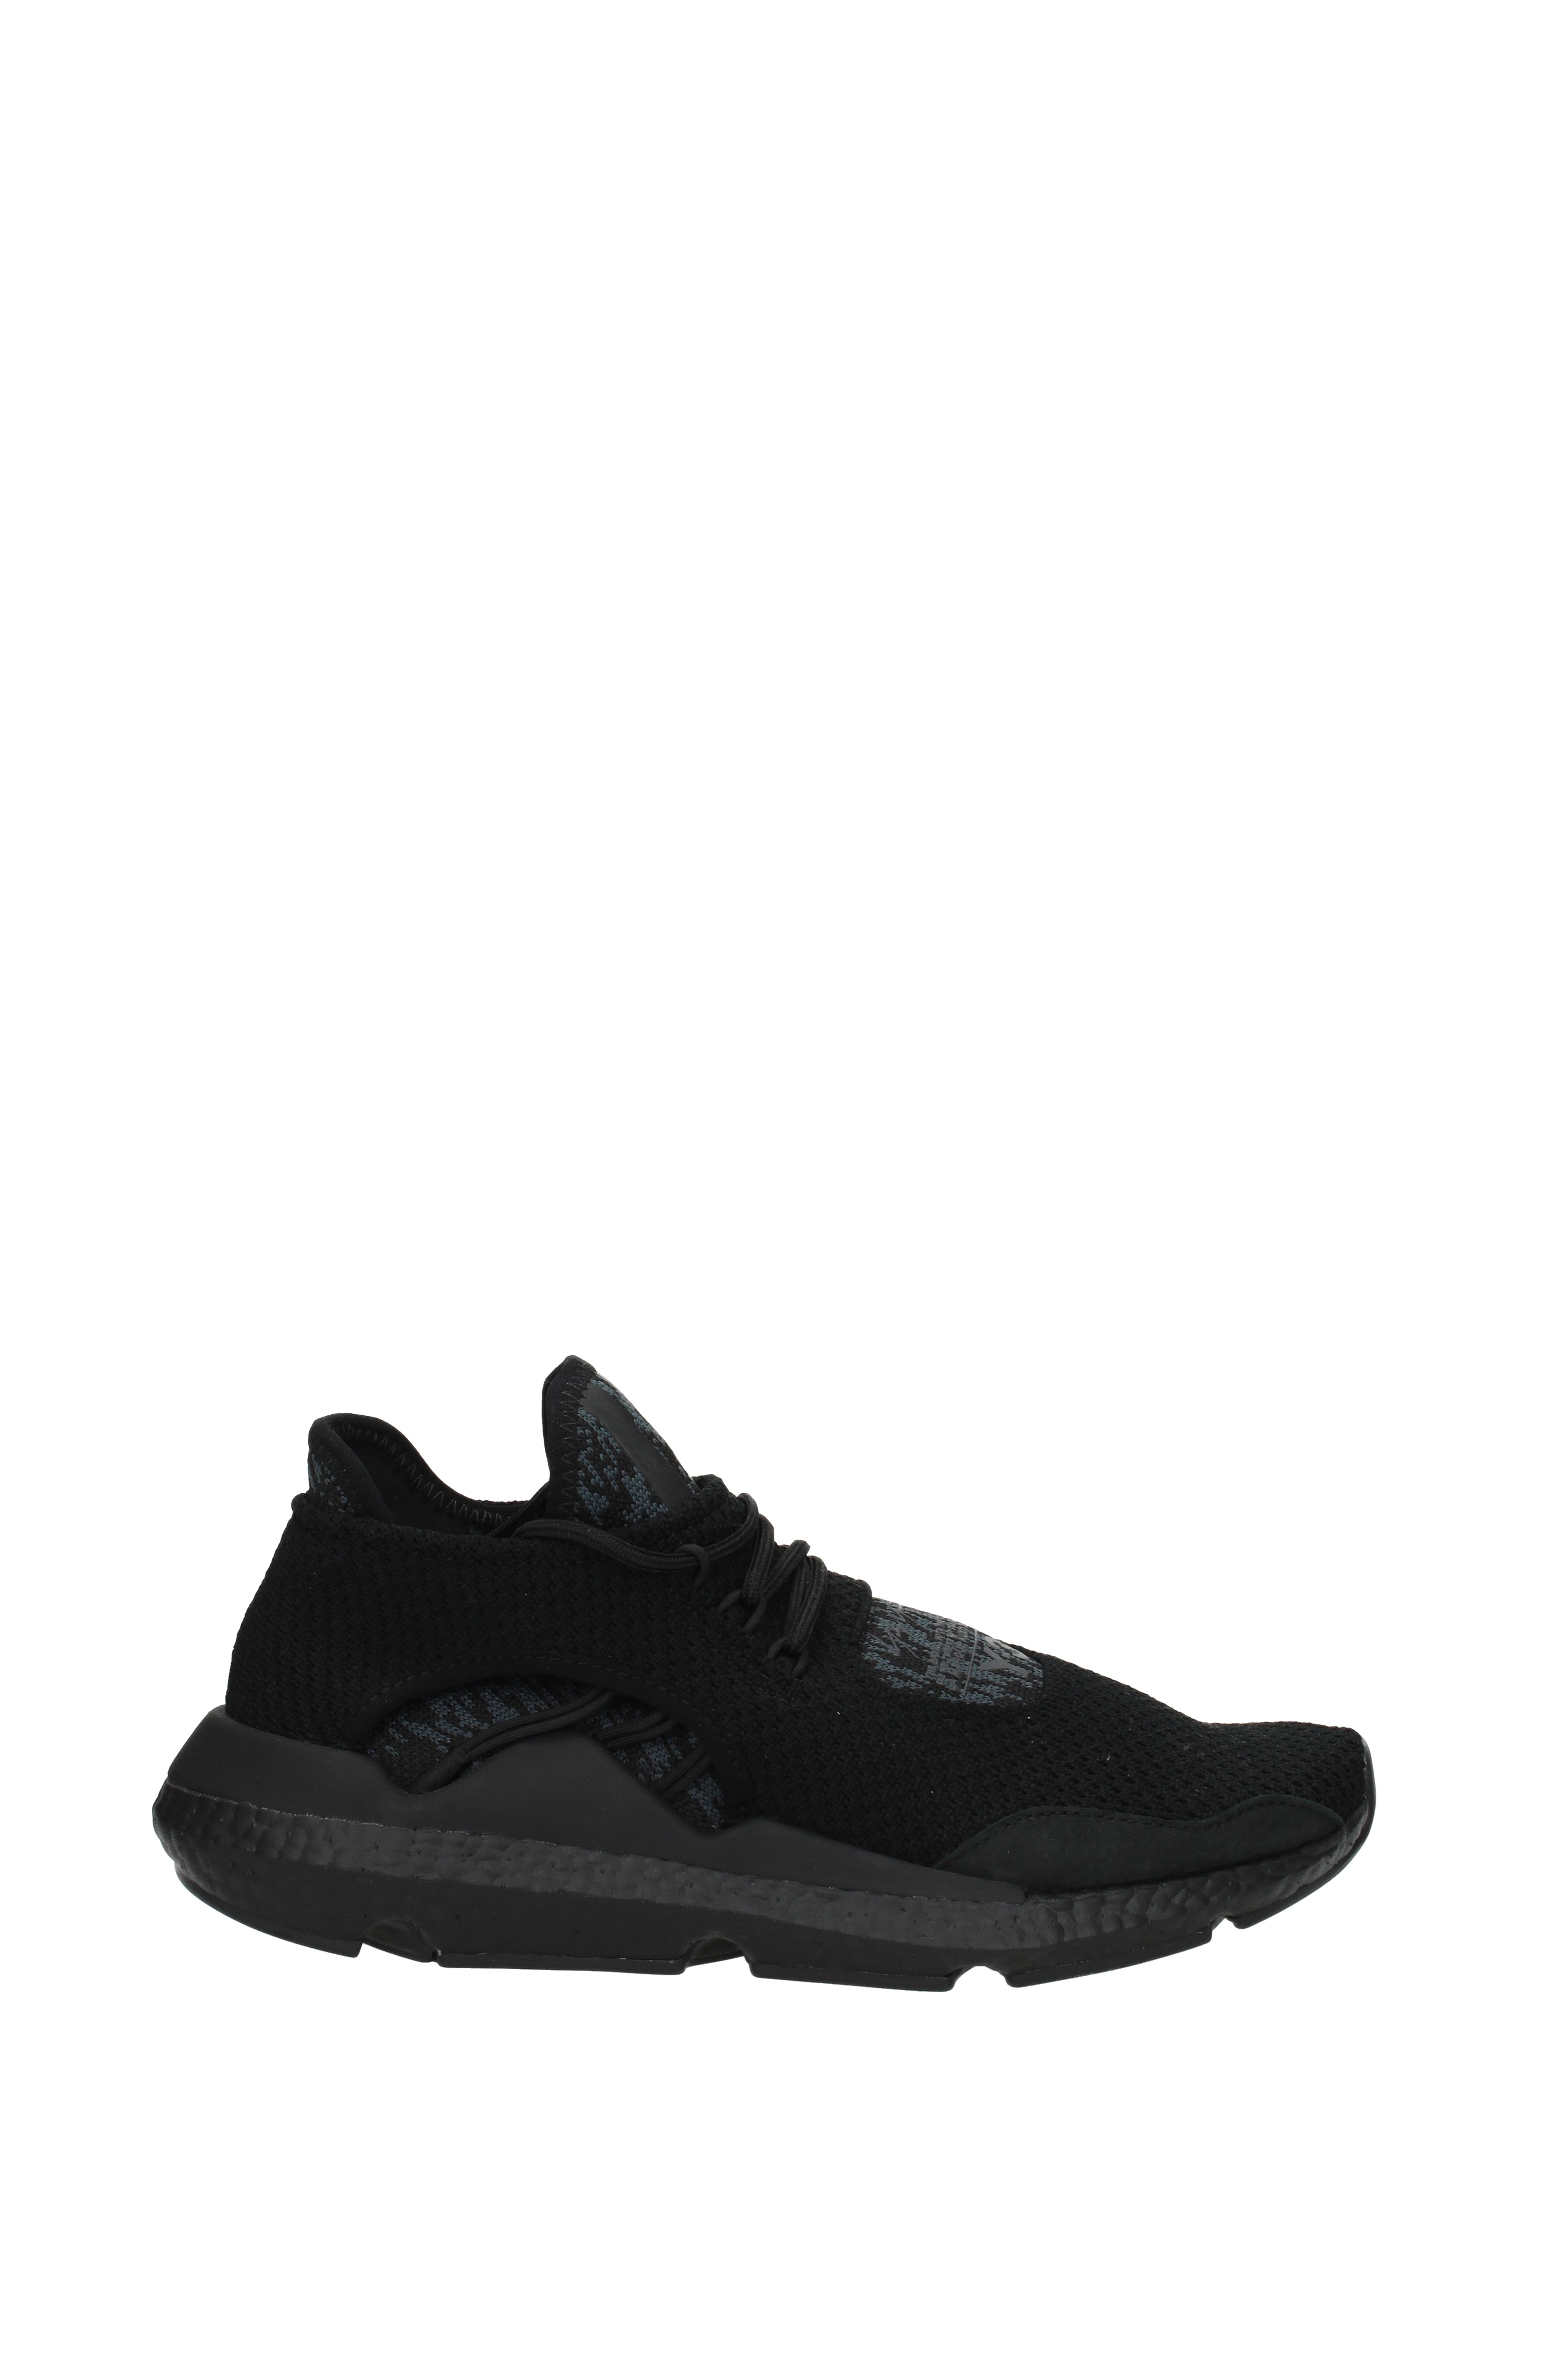 Sneakers  Y3 Yamamoto  Sneakers Herren - Stoff (SAIKOUAC719) 836c2e